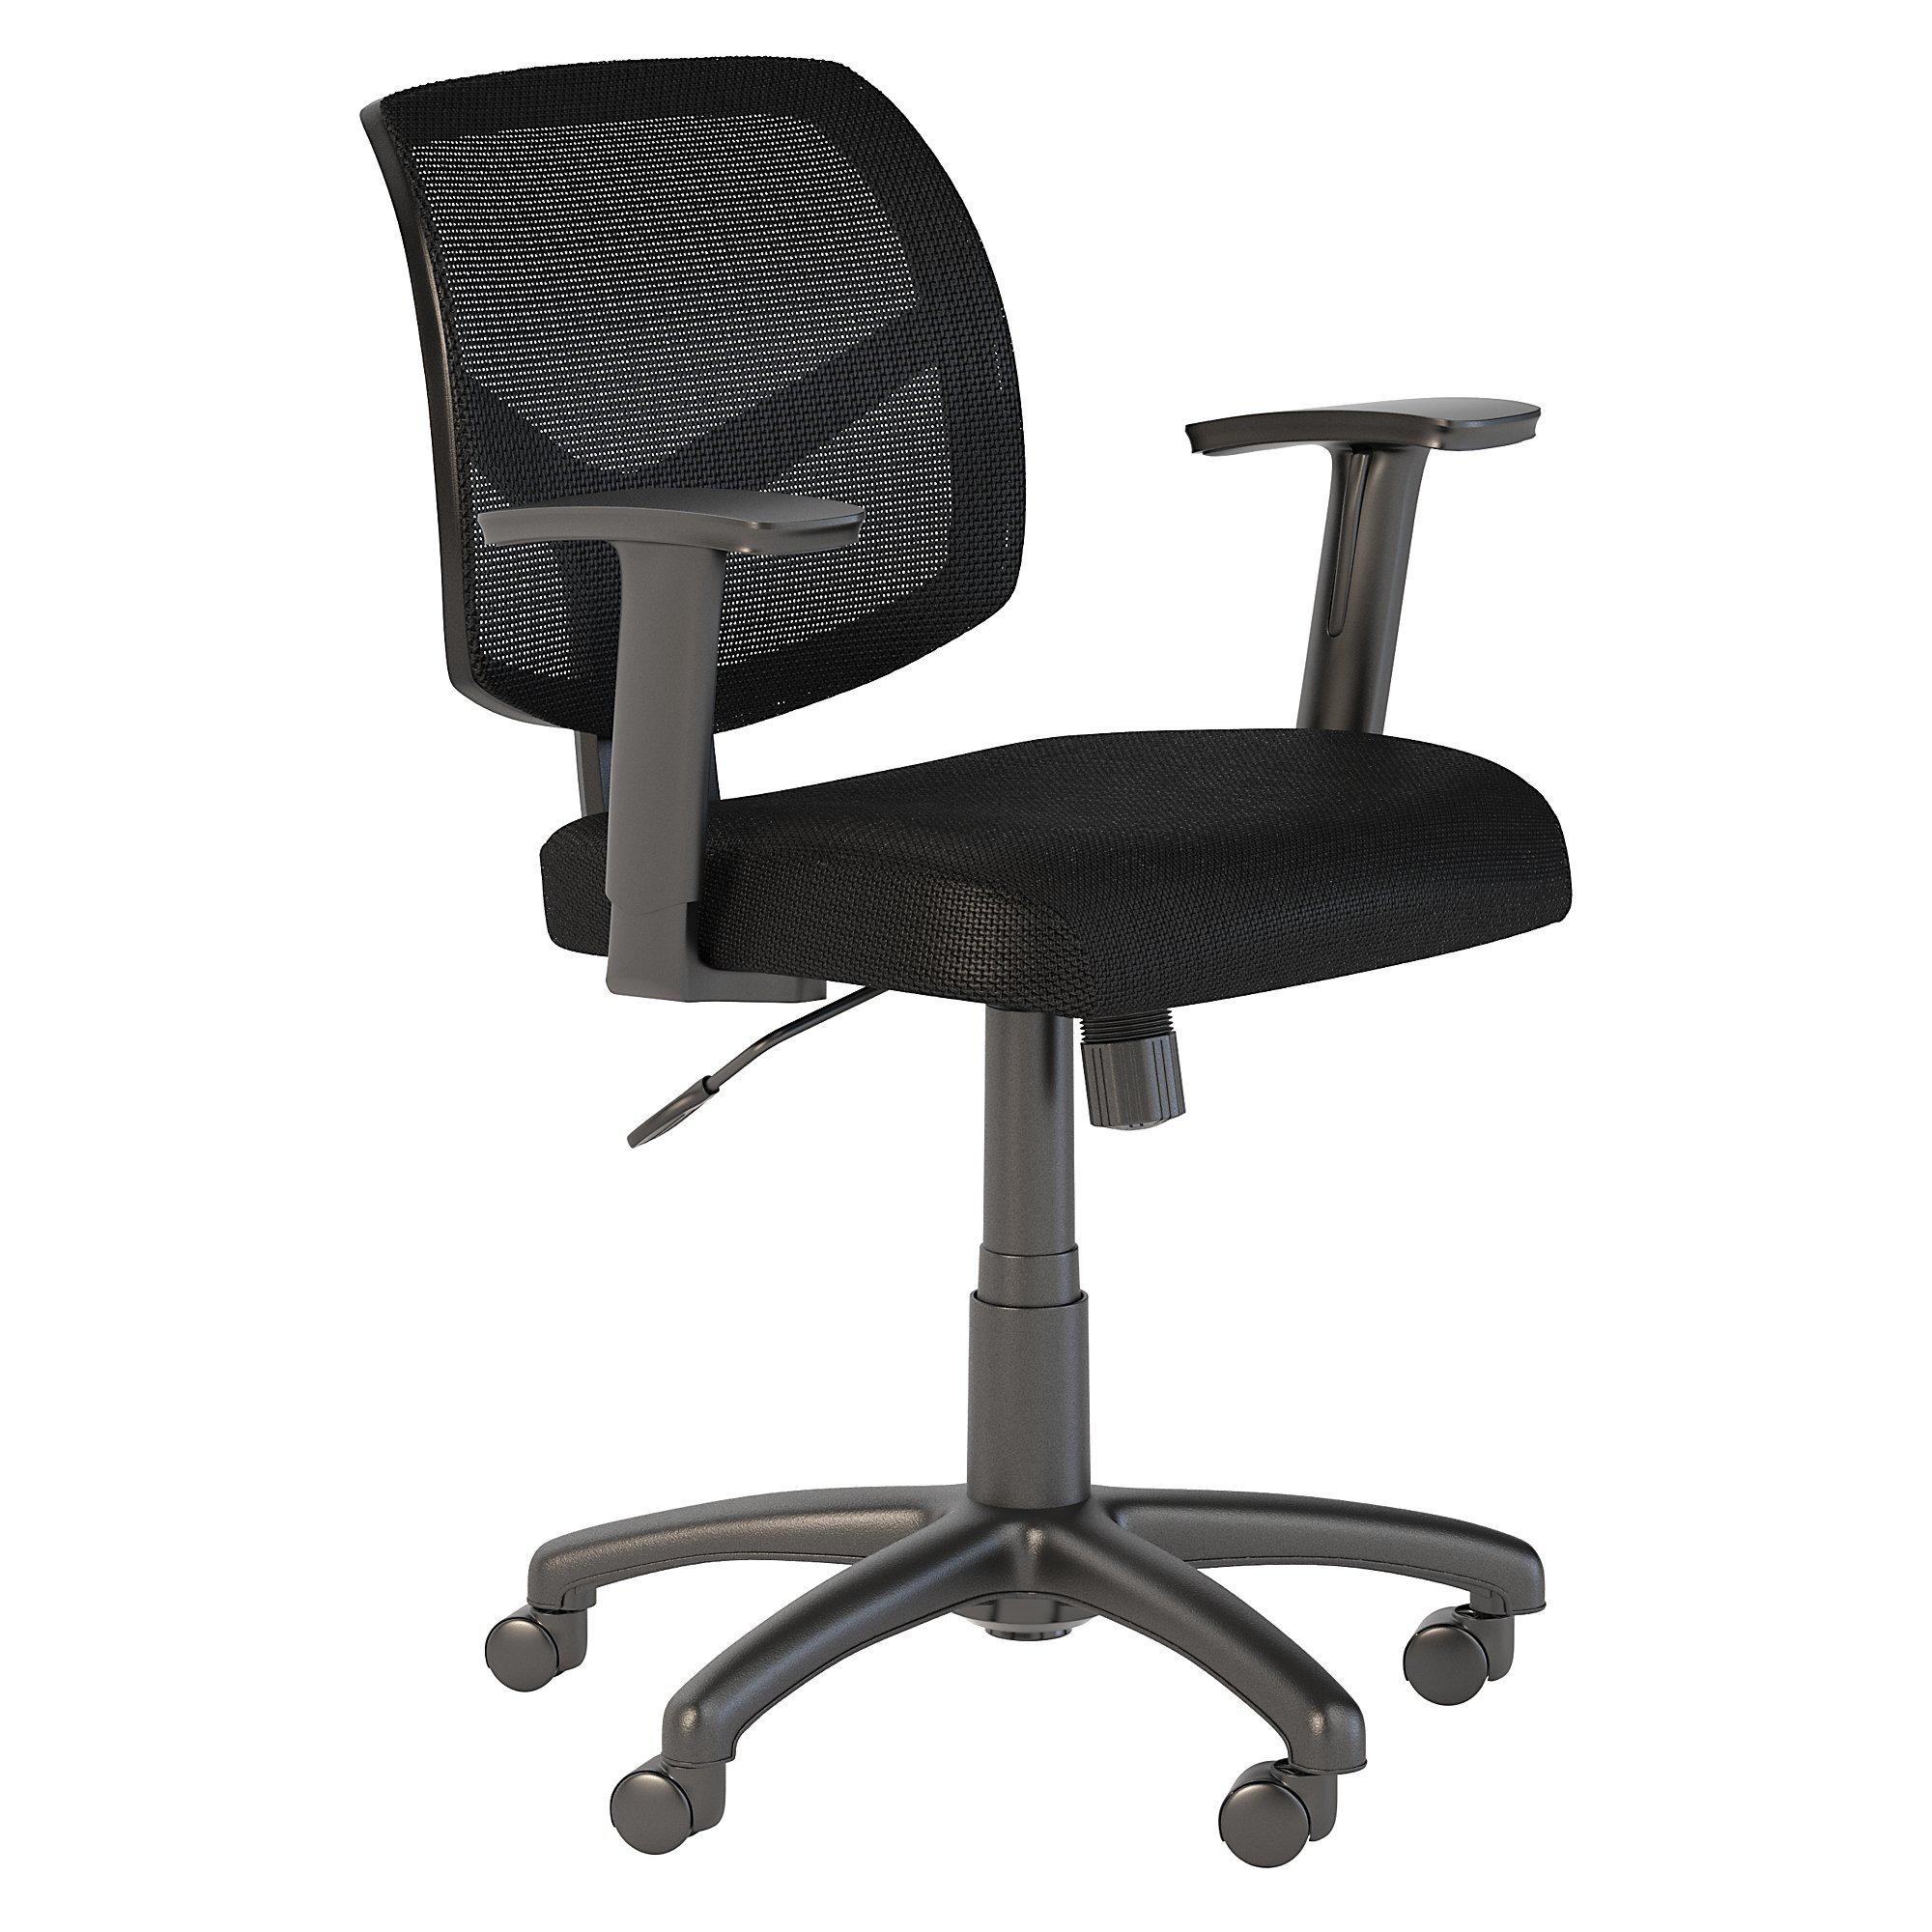 sc 1 st  Wayfair & Bush Business Furniture Petite Back Mesh Office Chair | Wayfair